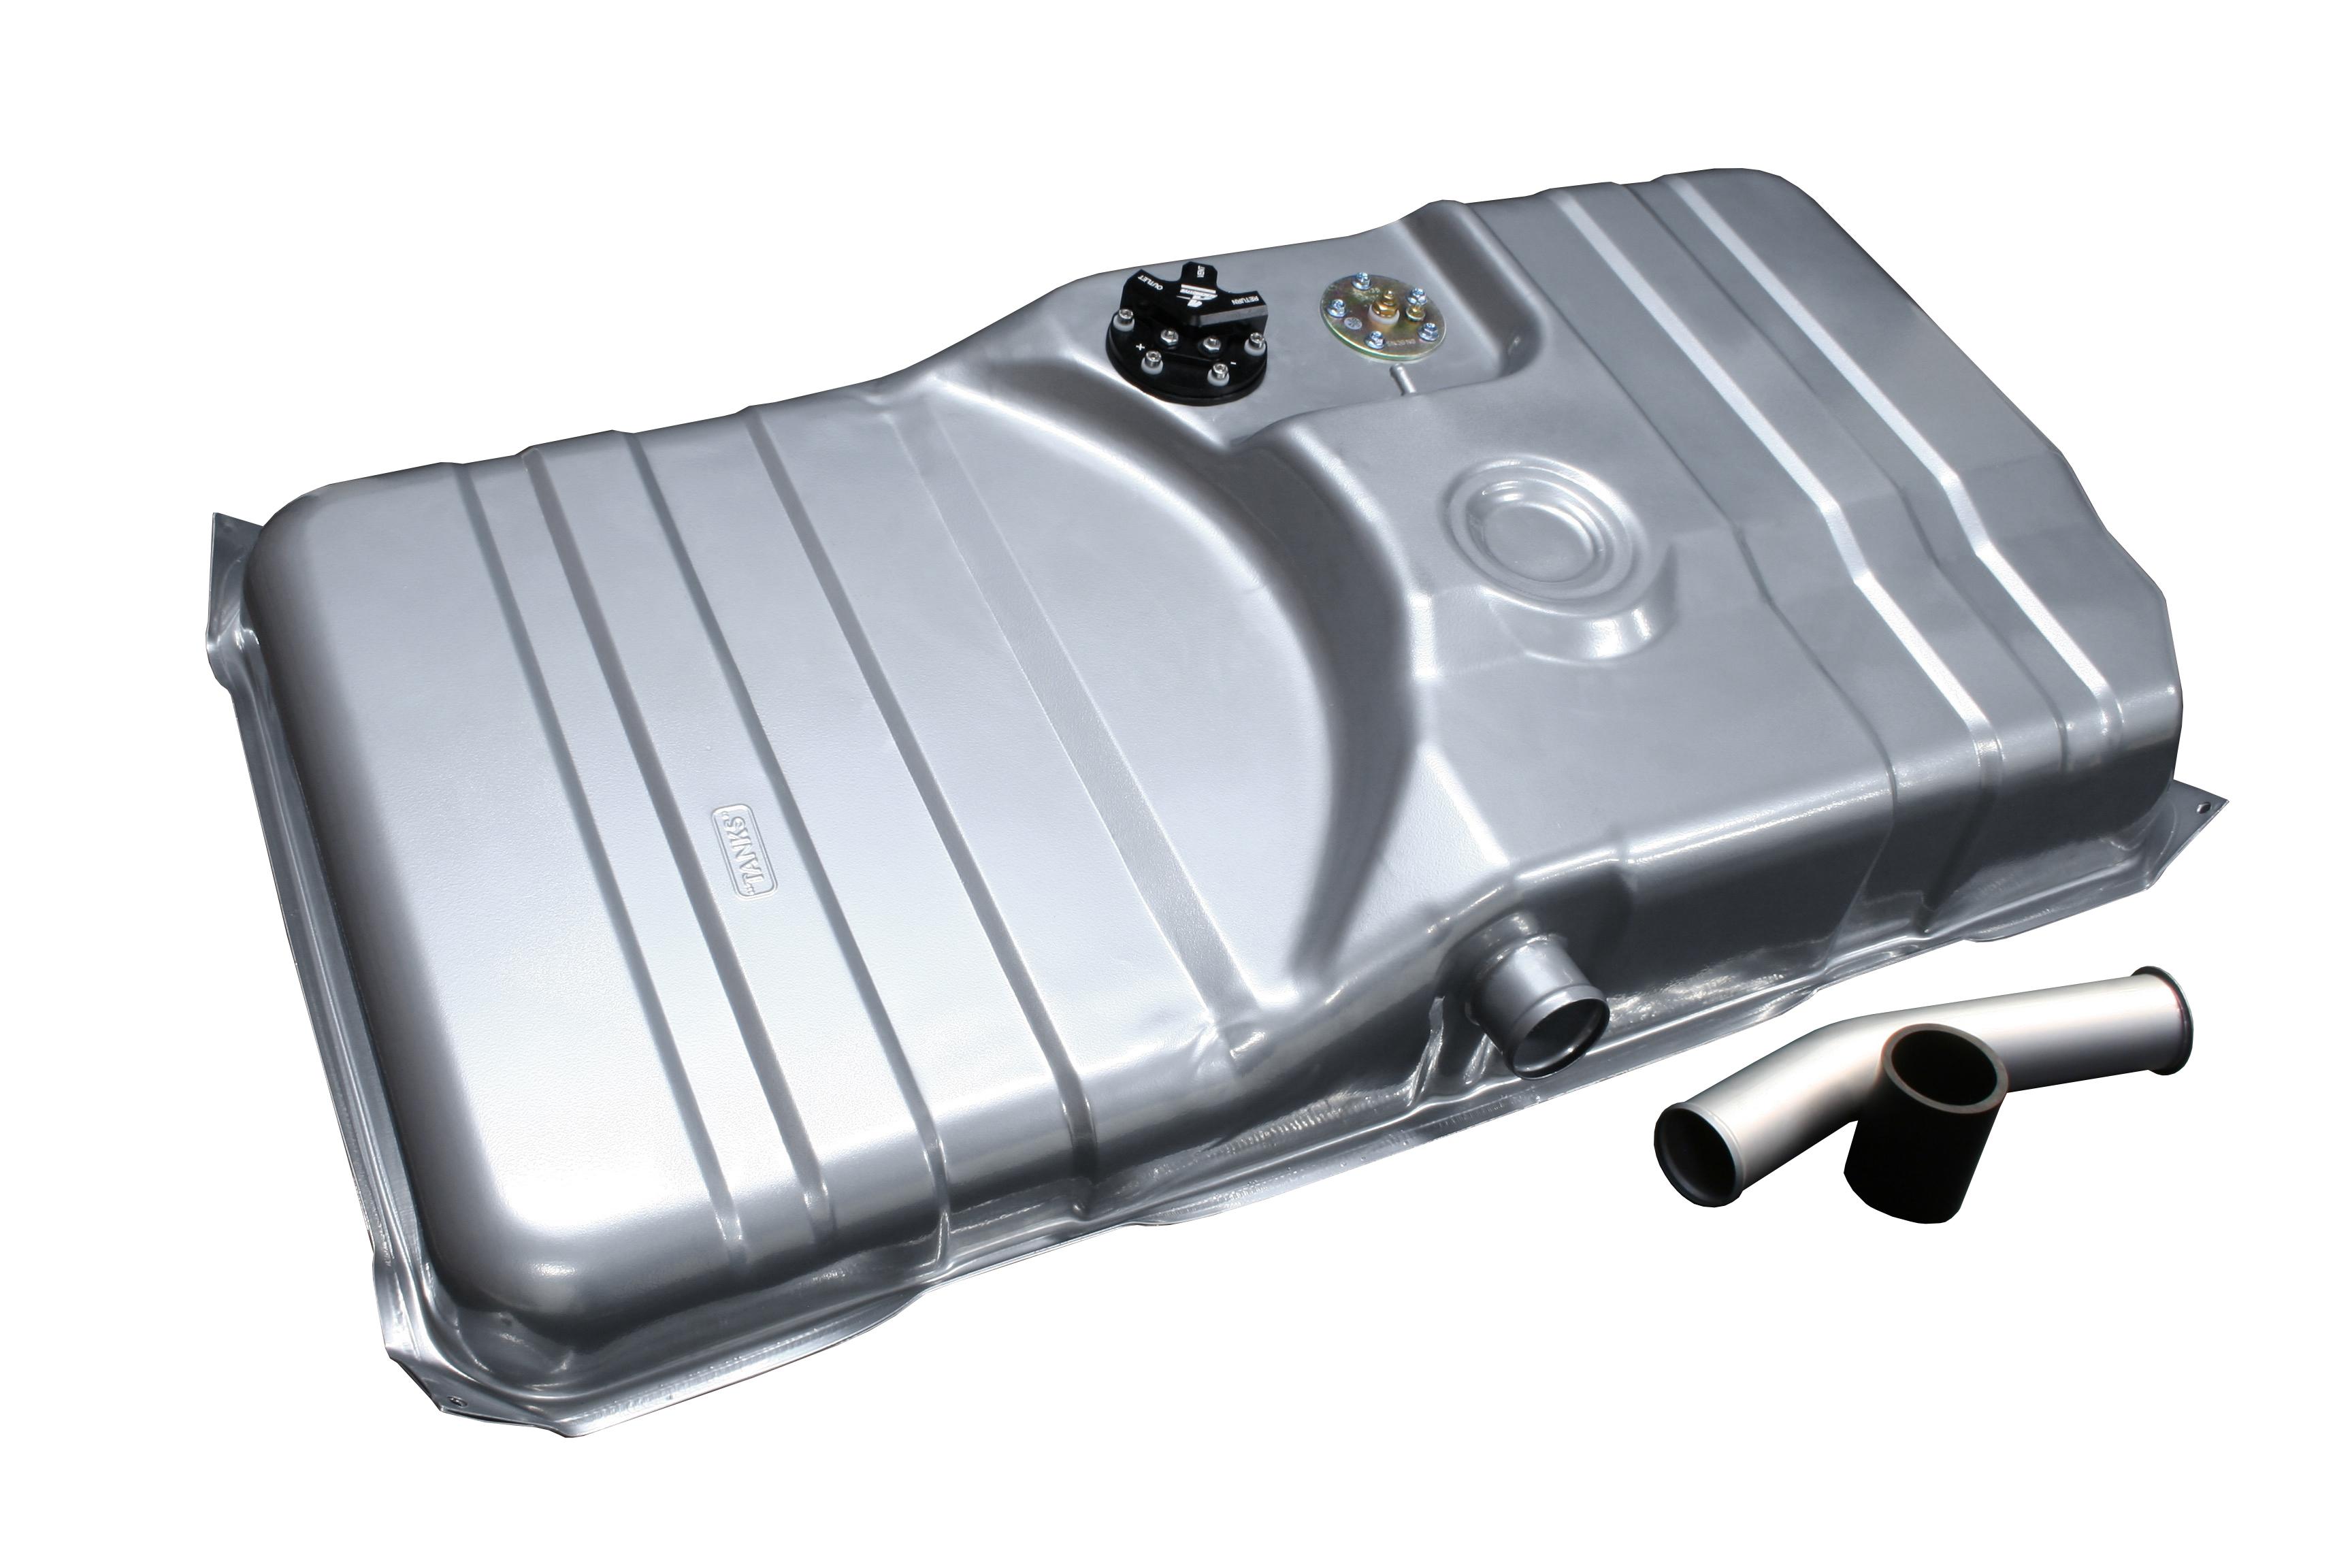 75 79 Nova 340 Stealth Fuel Tank Aeromotive Inc